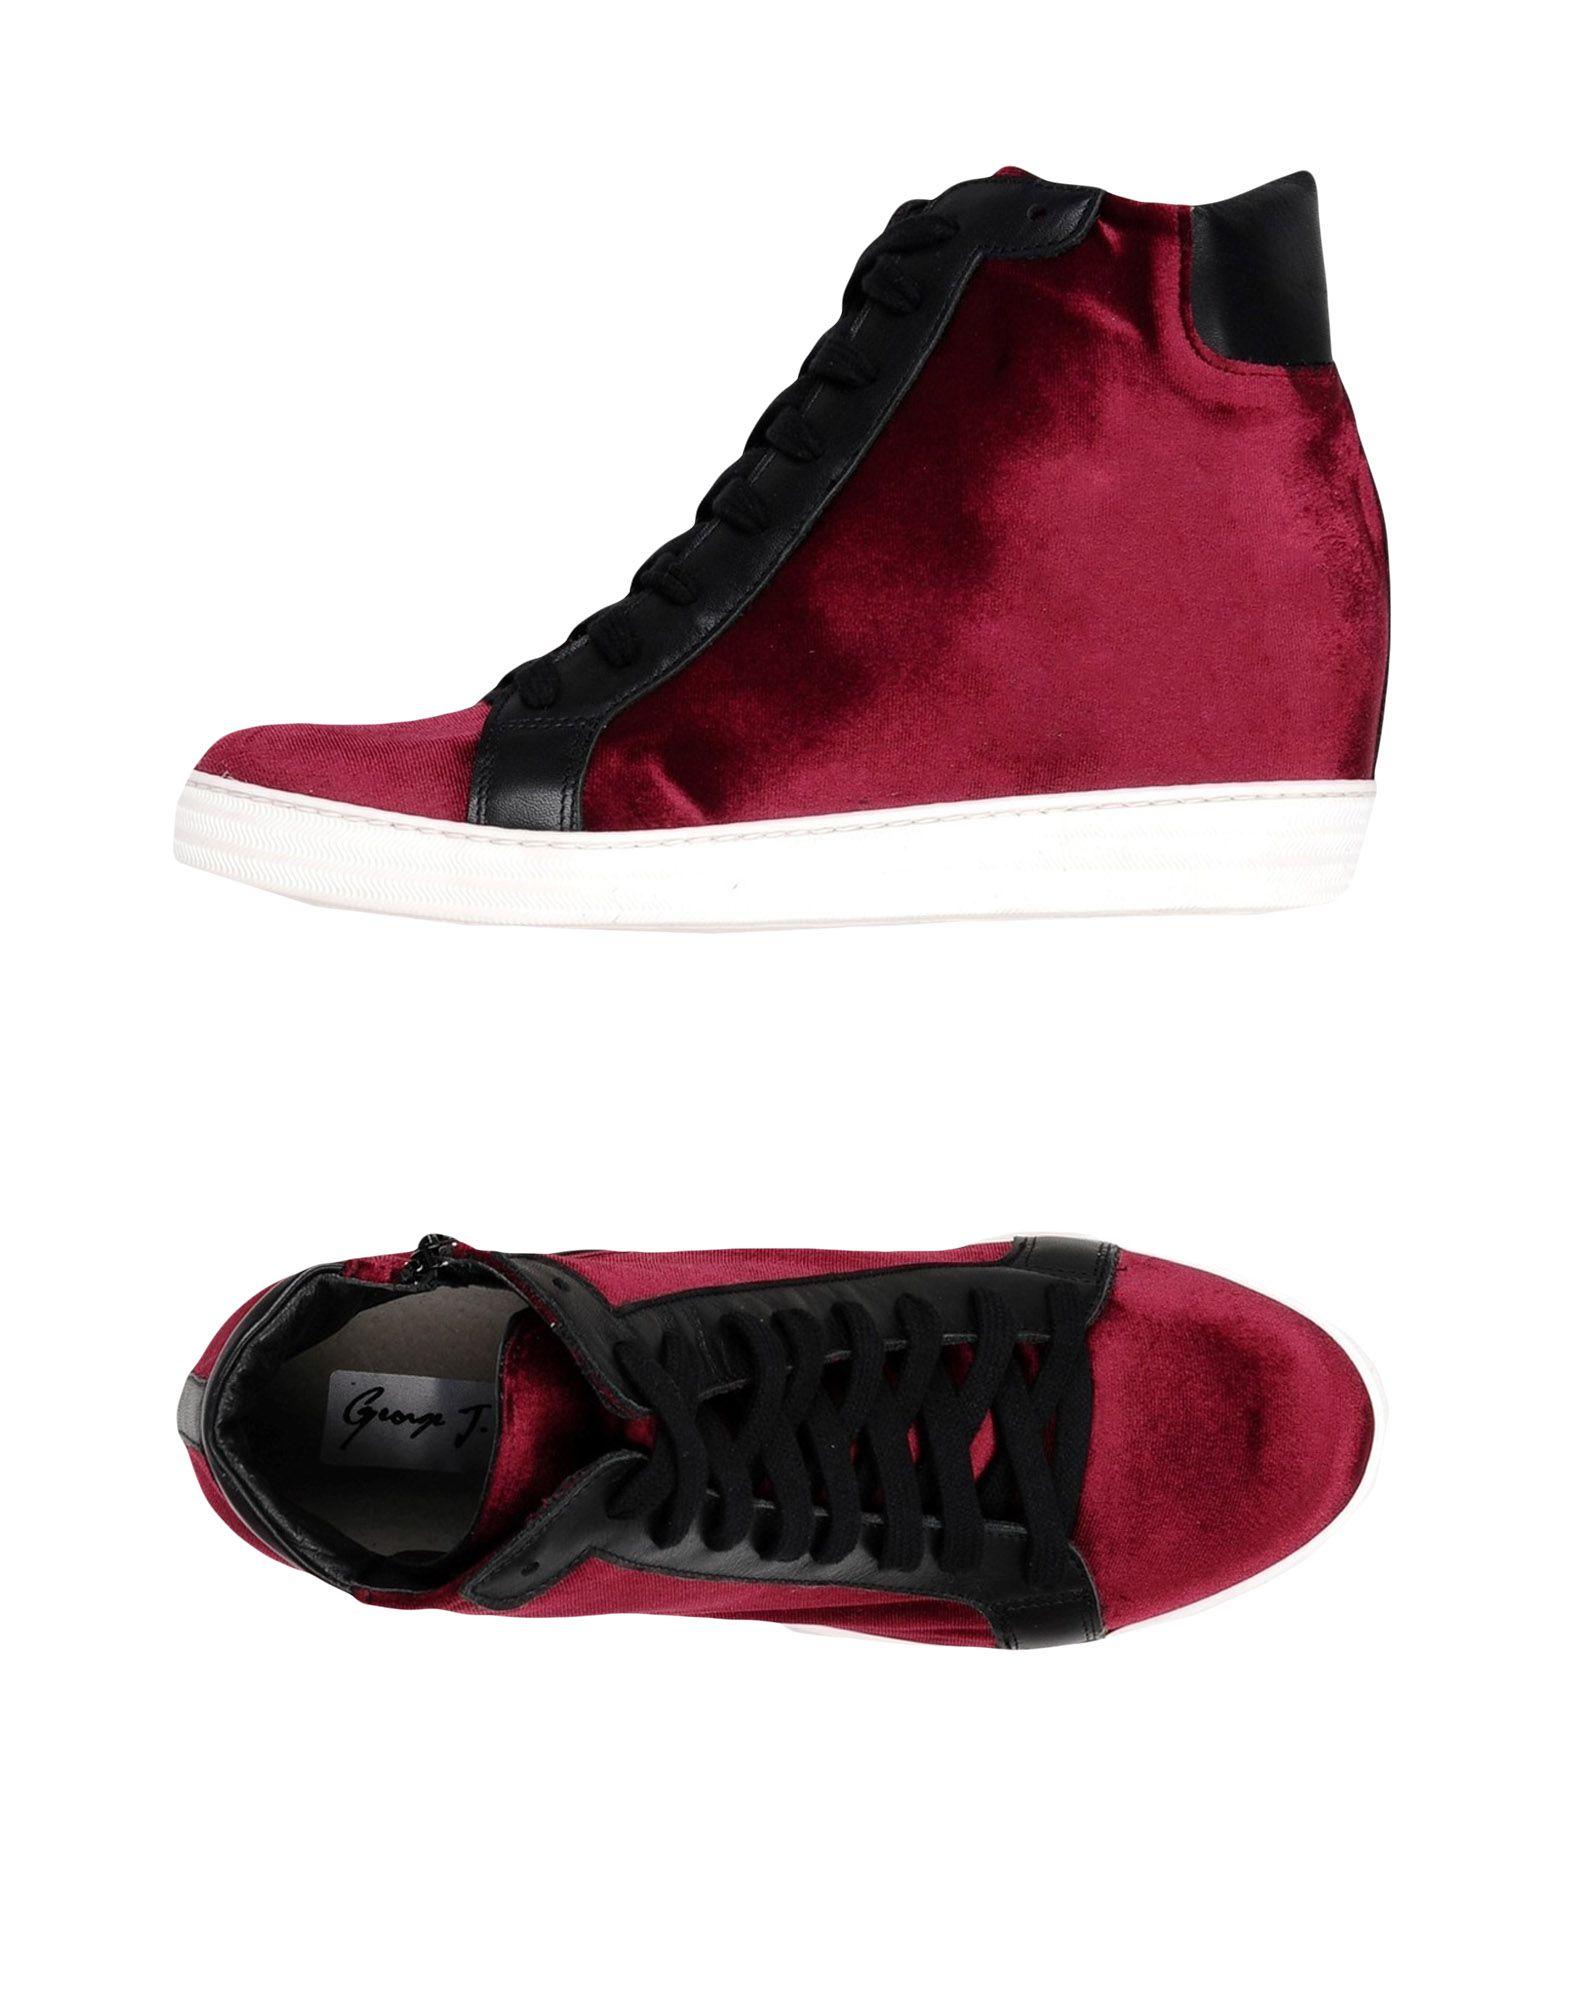 GEORGE J. LOVE Damen High Sneakers & Tennisschuhe Farbe Purpur Größe 11